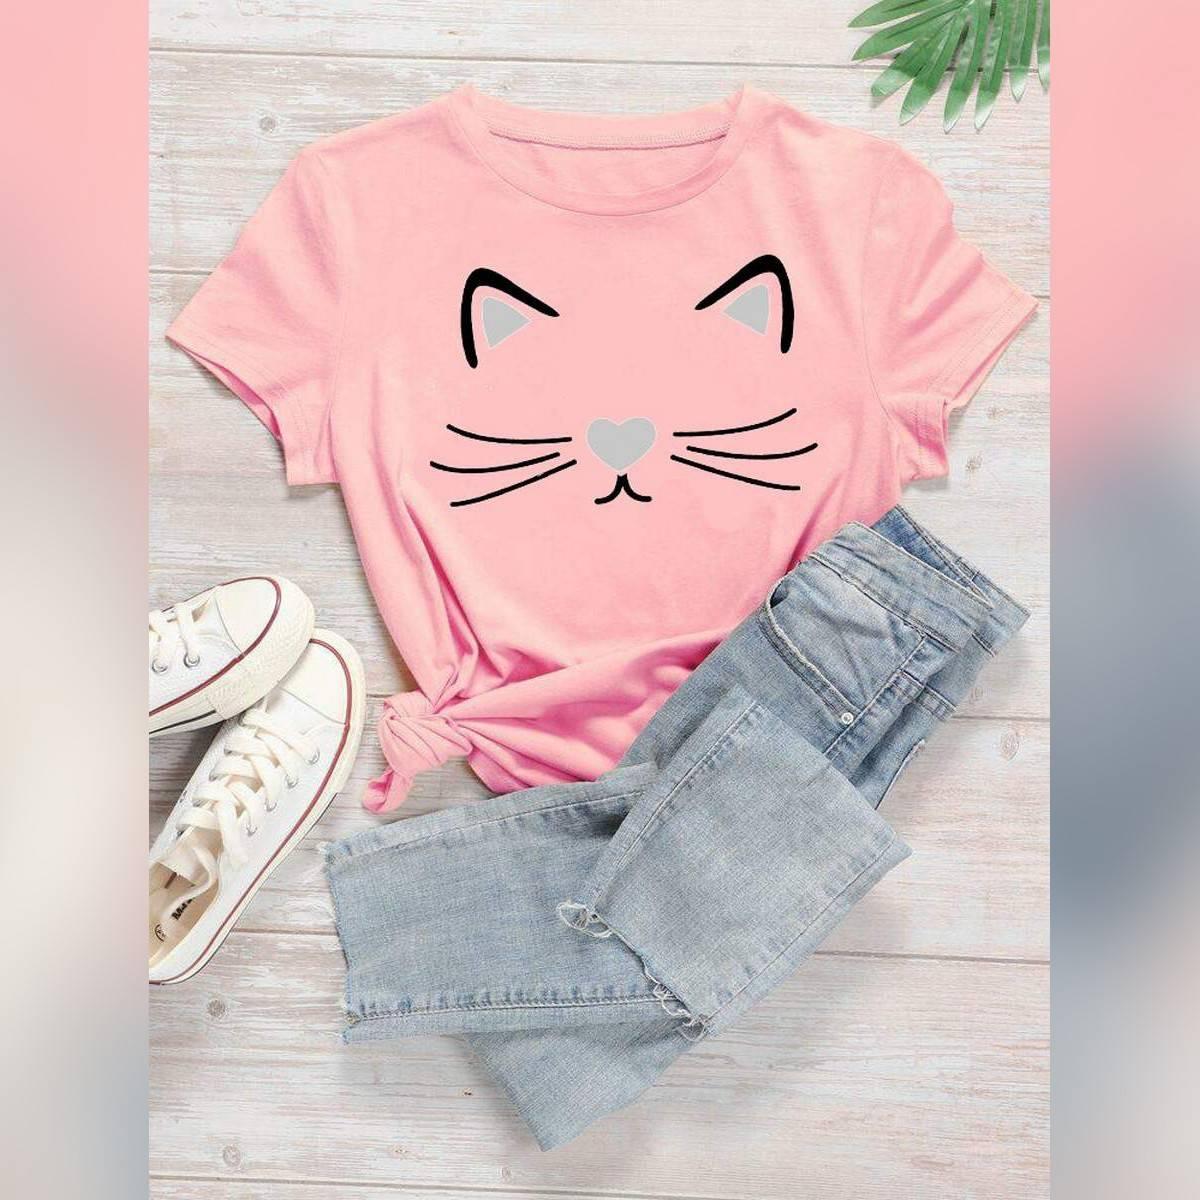 Meow Printed shirt Half sleeve for girls & Women